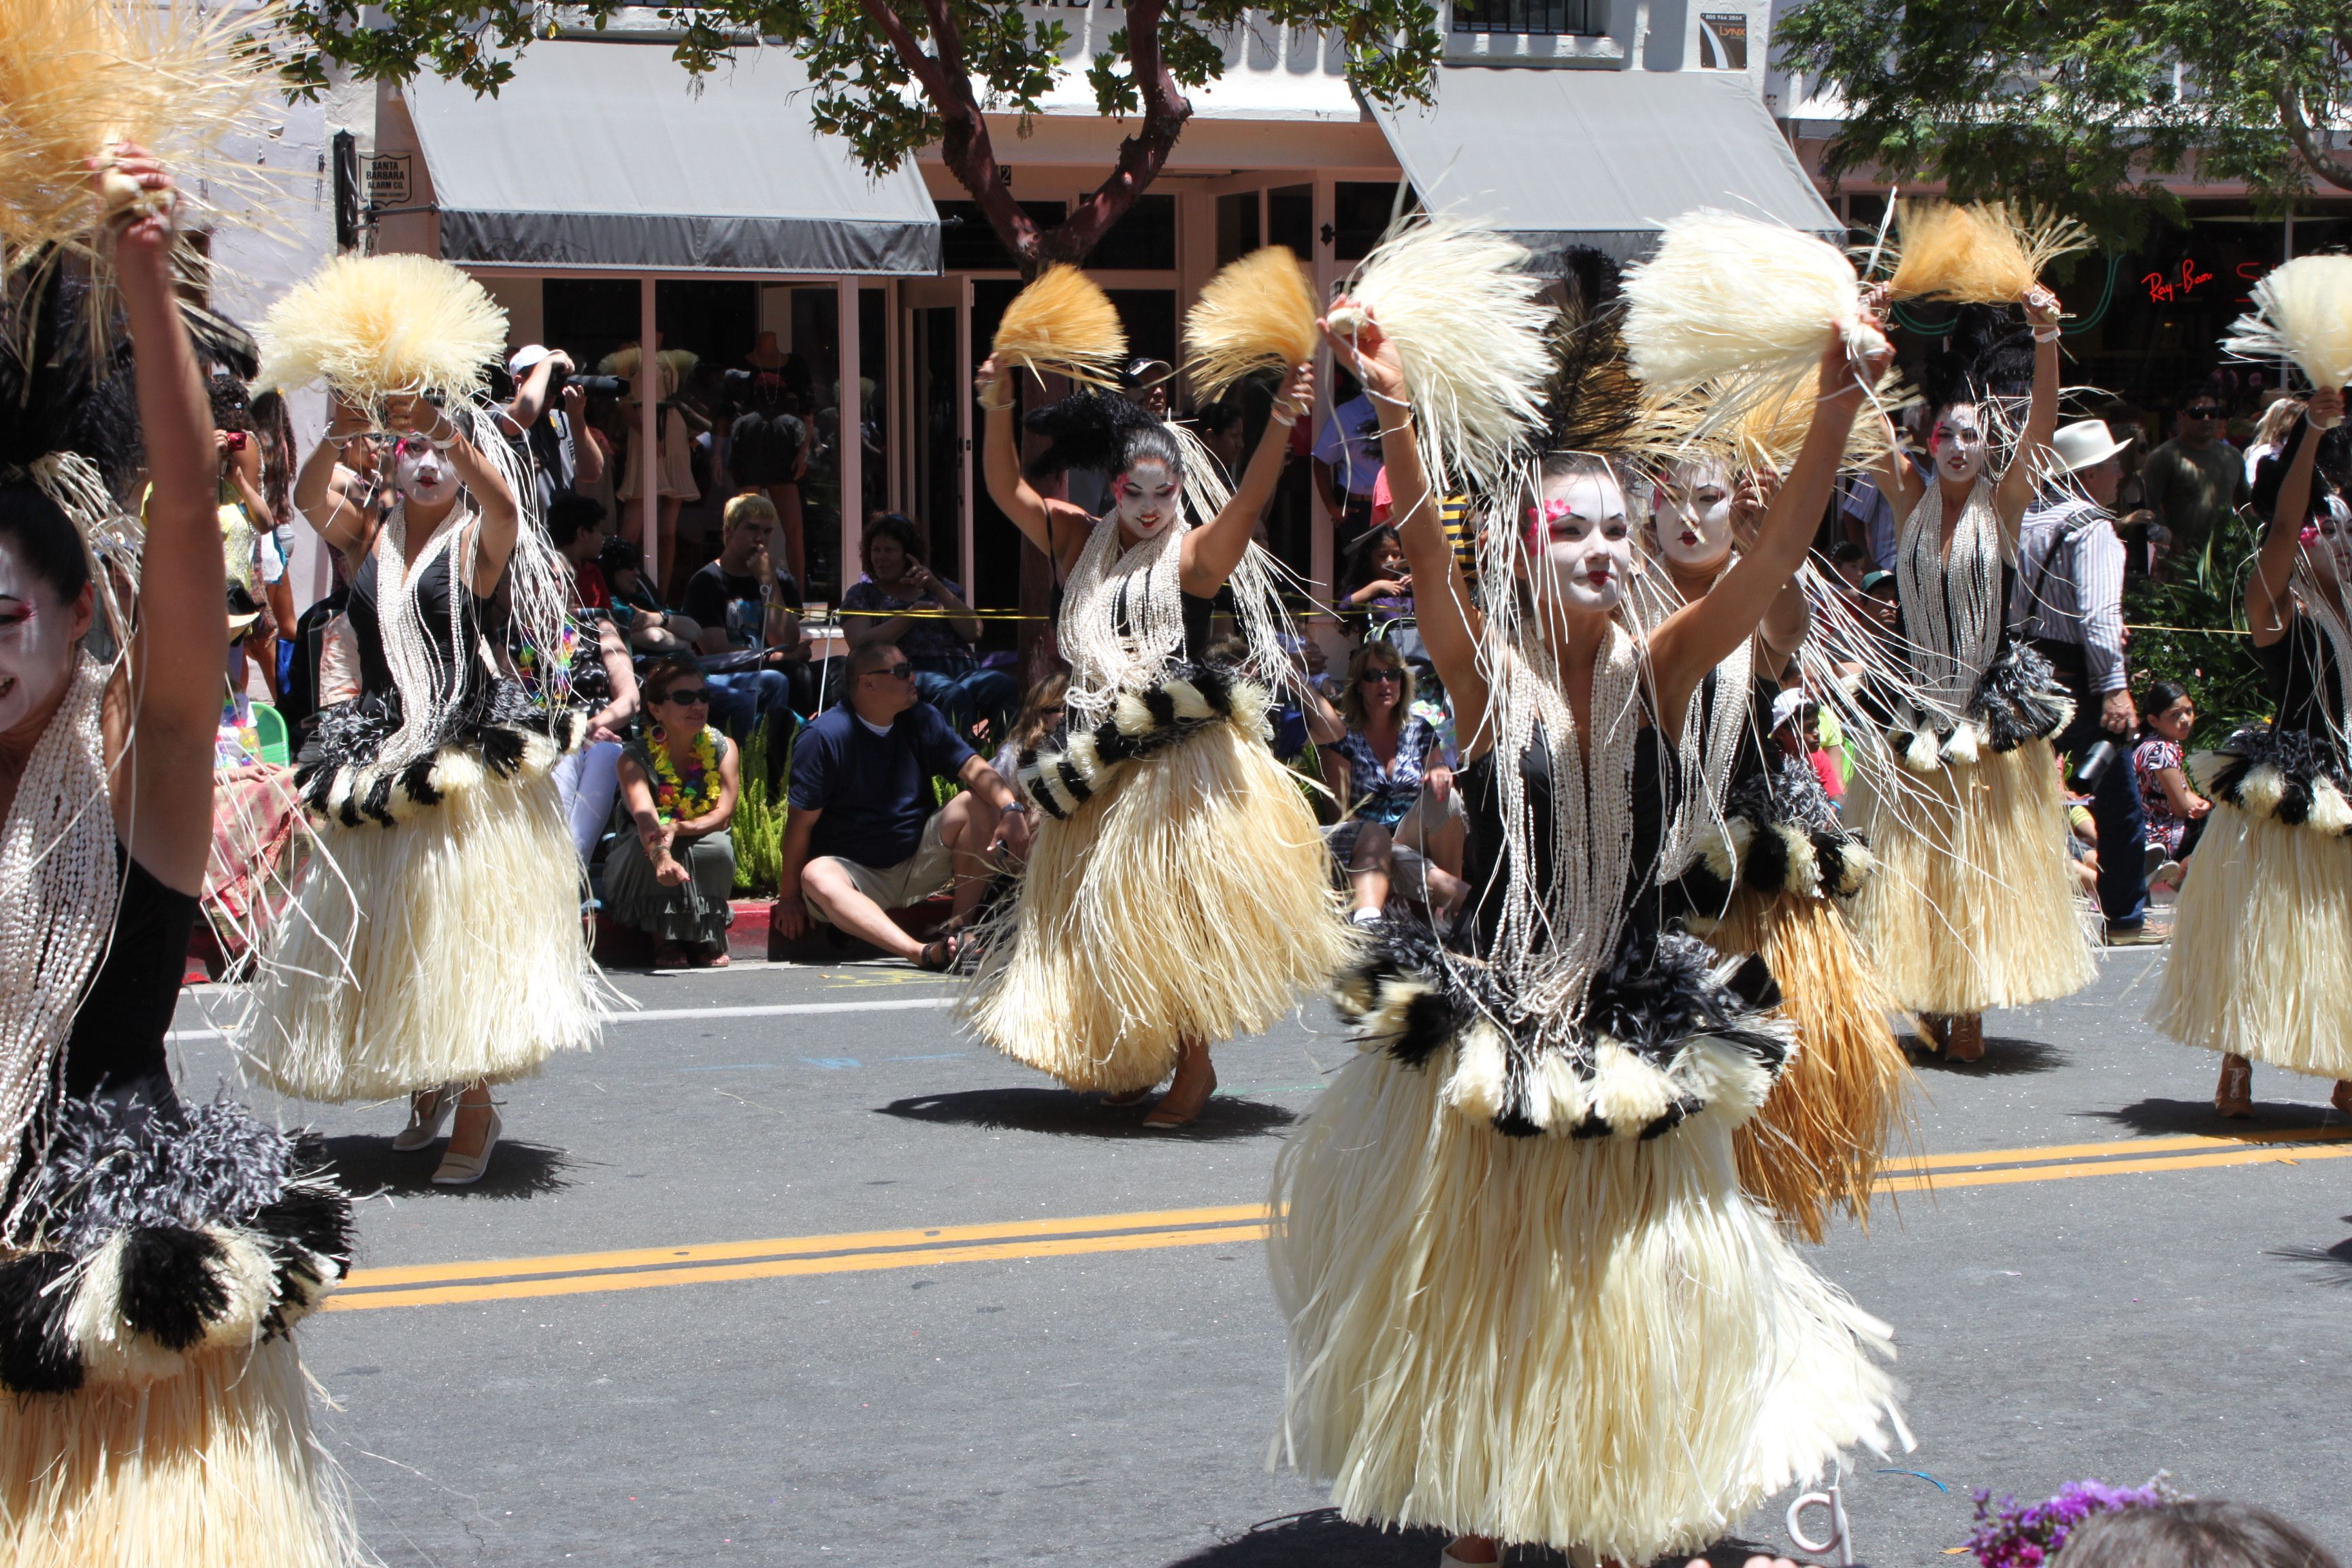 Santa Barbara Summer Solstice | Santa Barbara Solstice | Pinterest ...